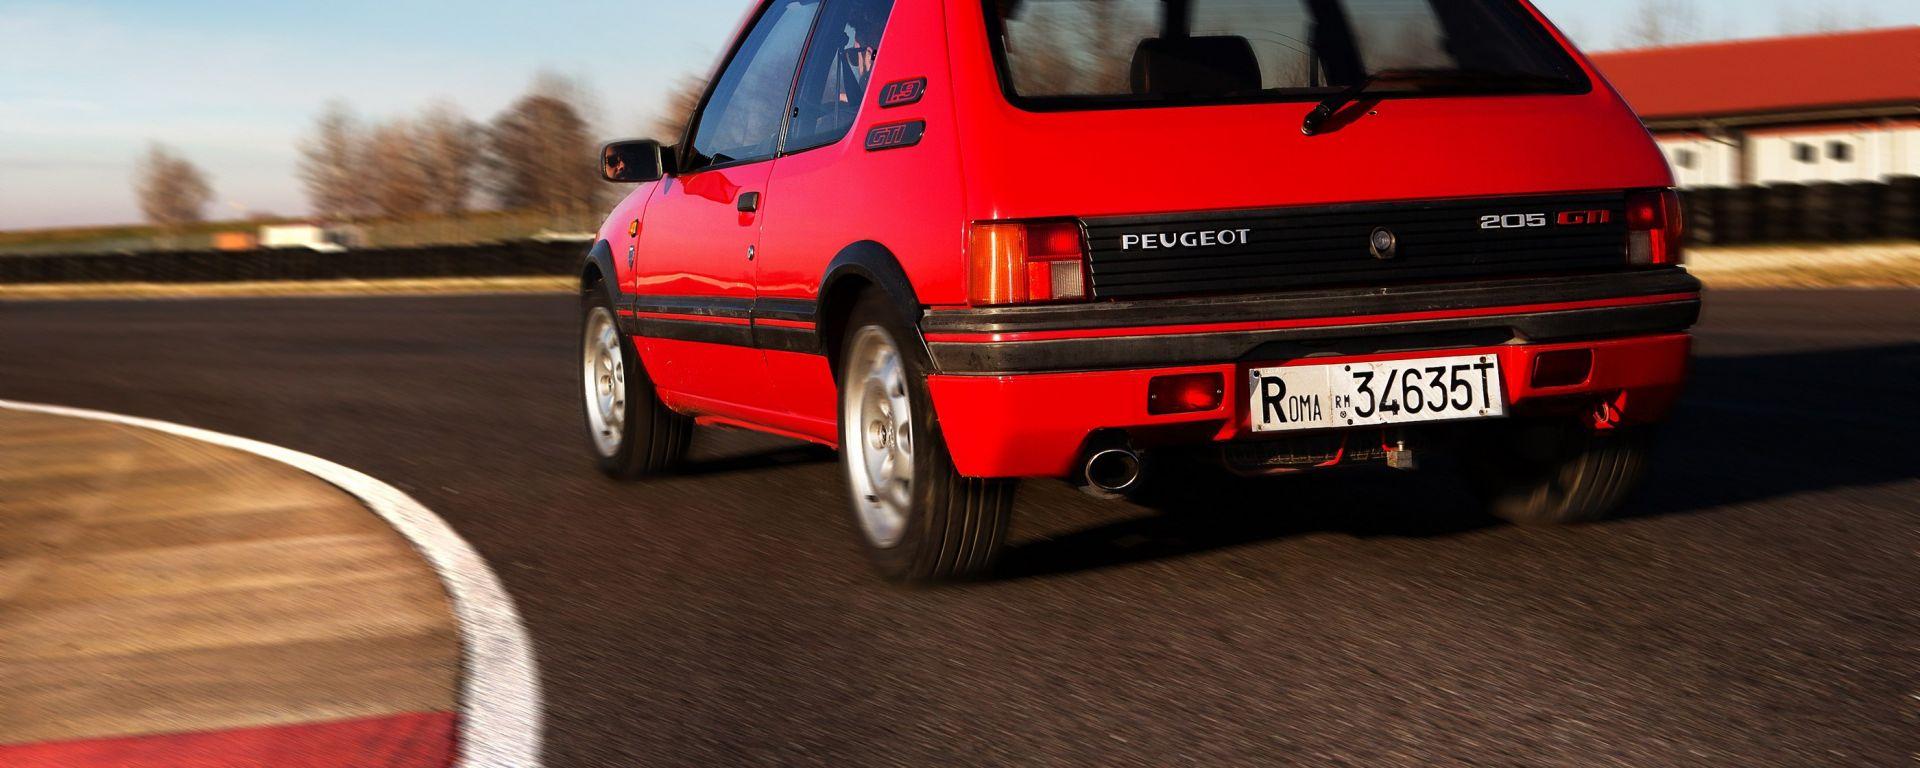 Guidare oggi la Peugeot 205 GTI